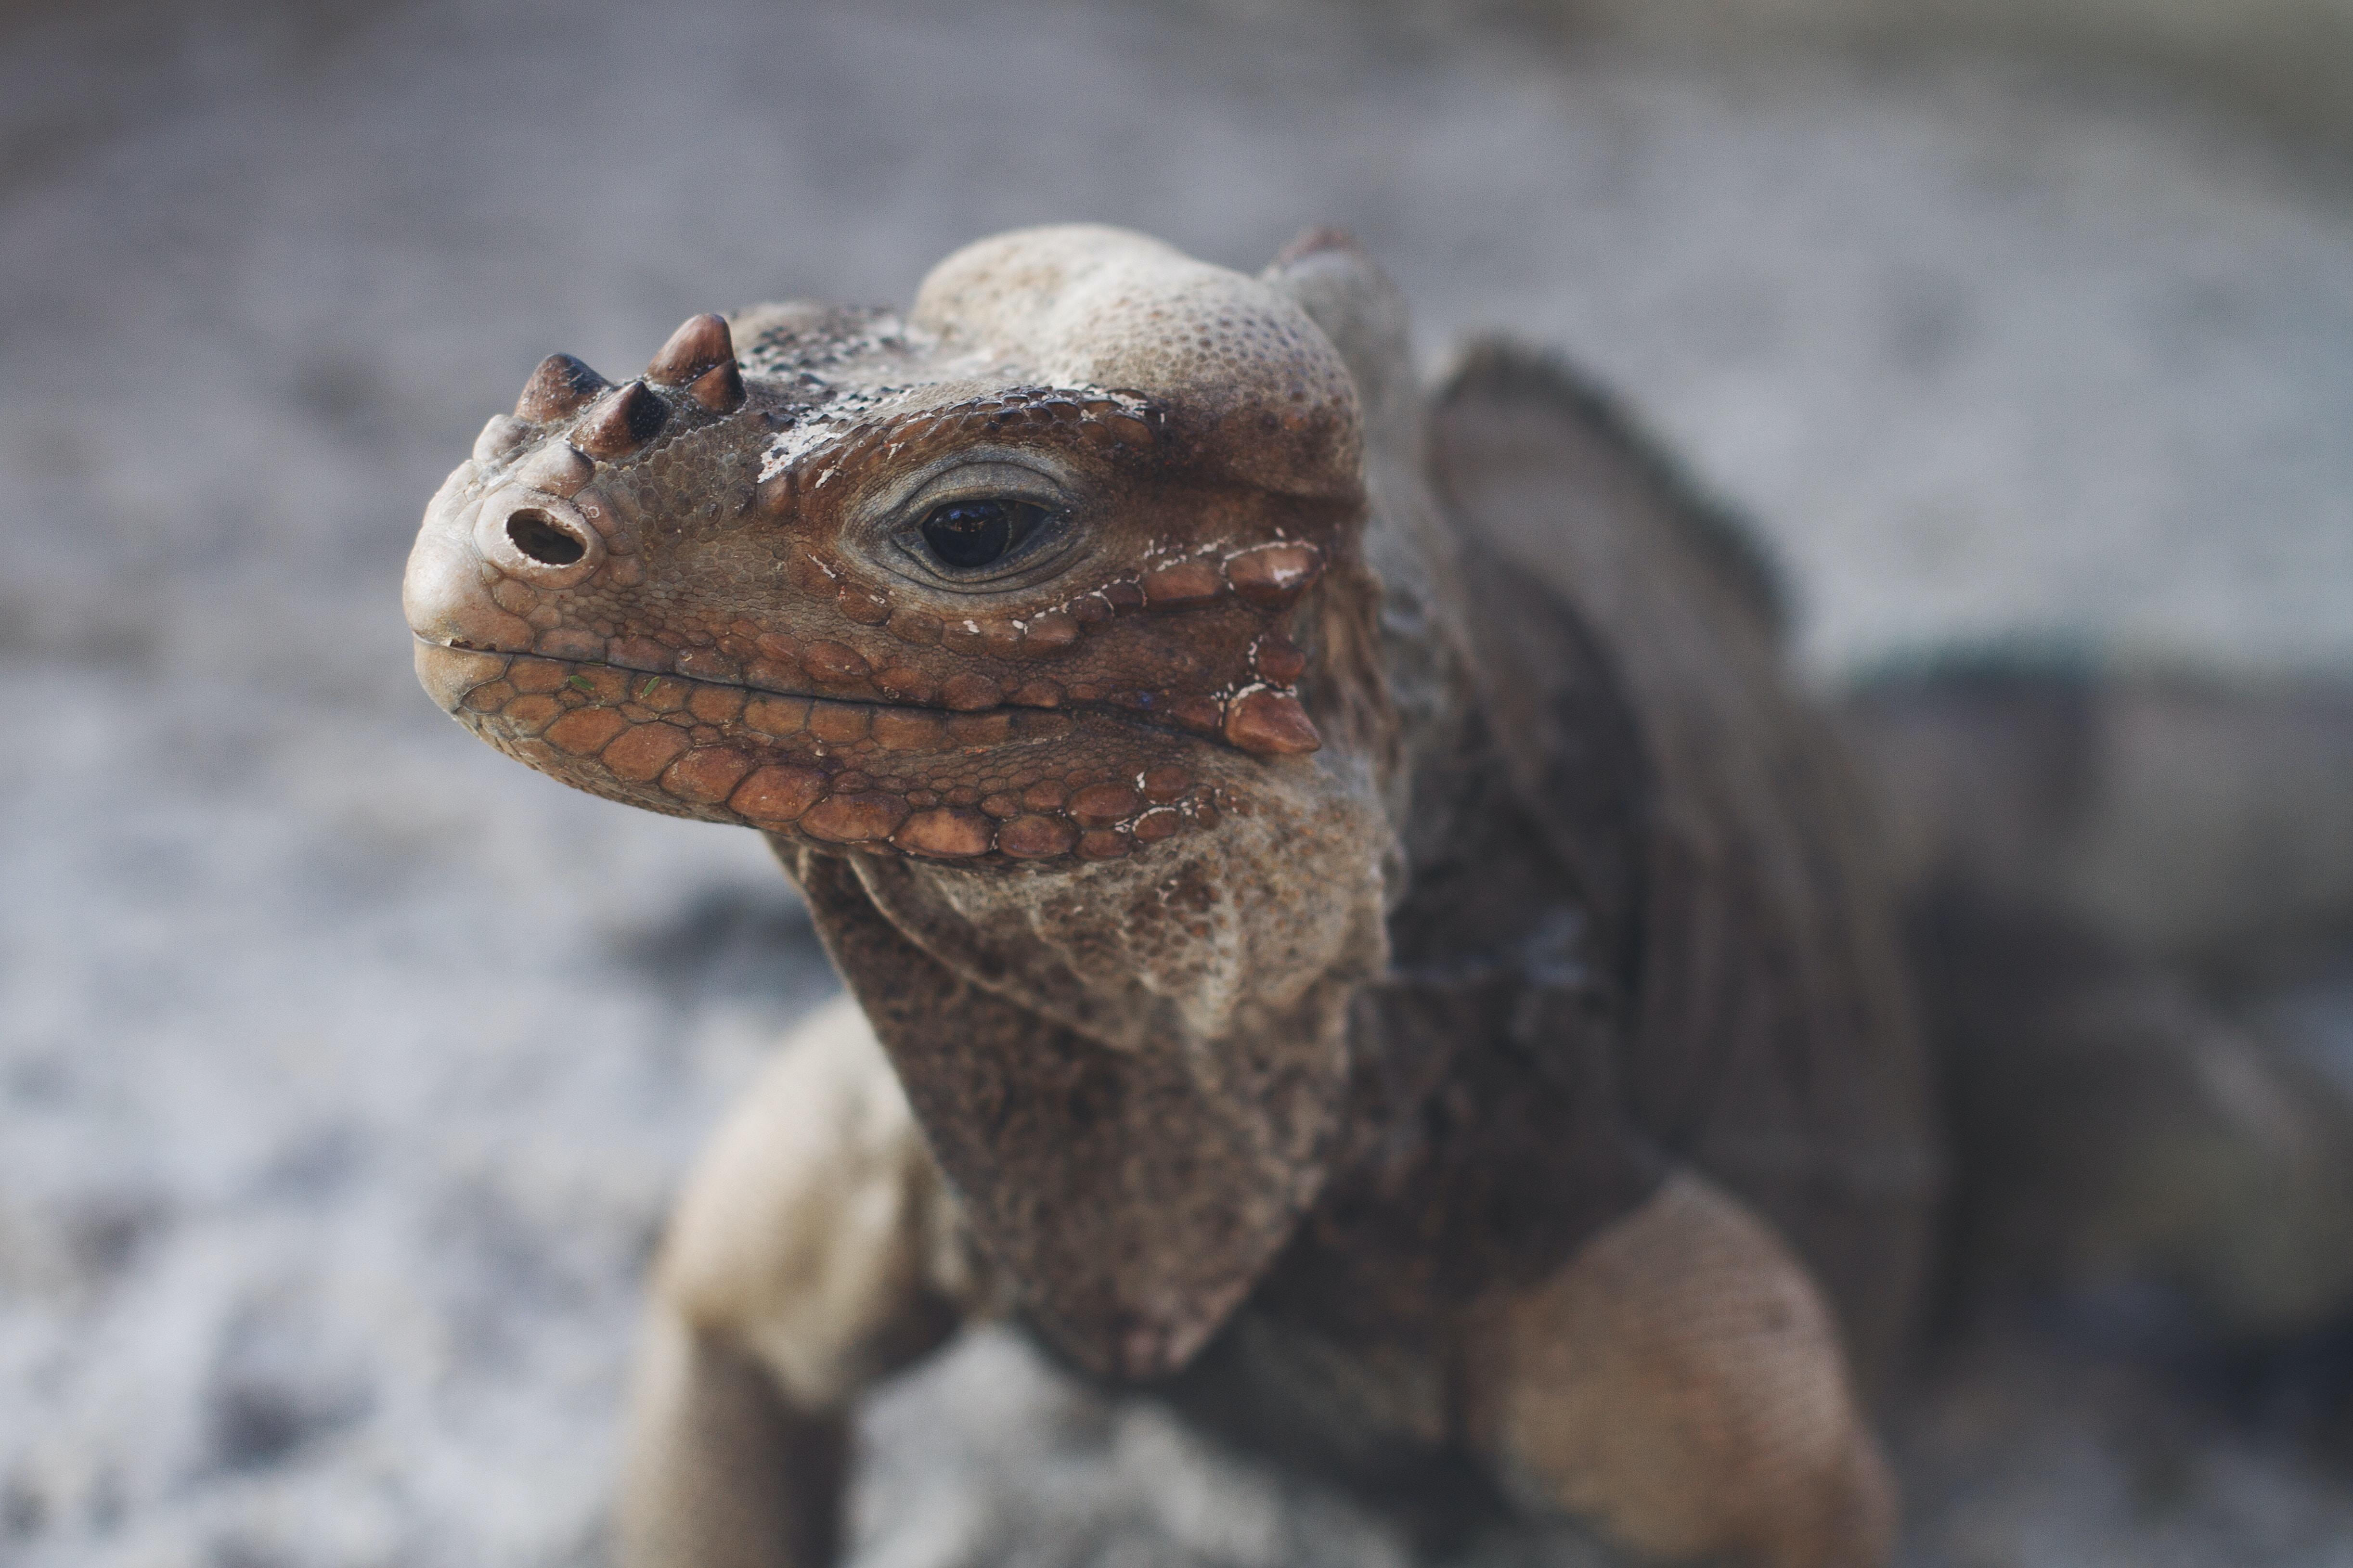 tilt shift lens photography of commodo dragon